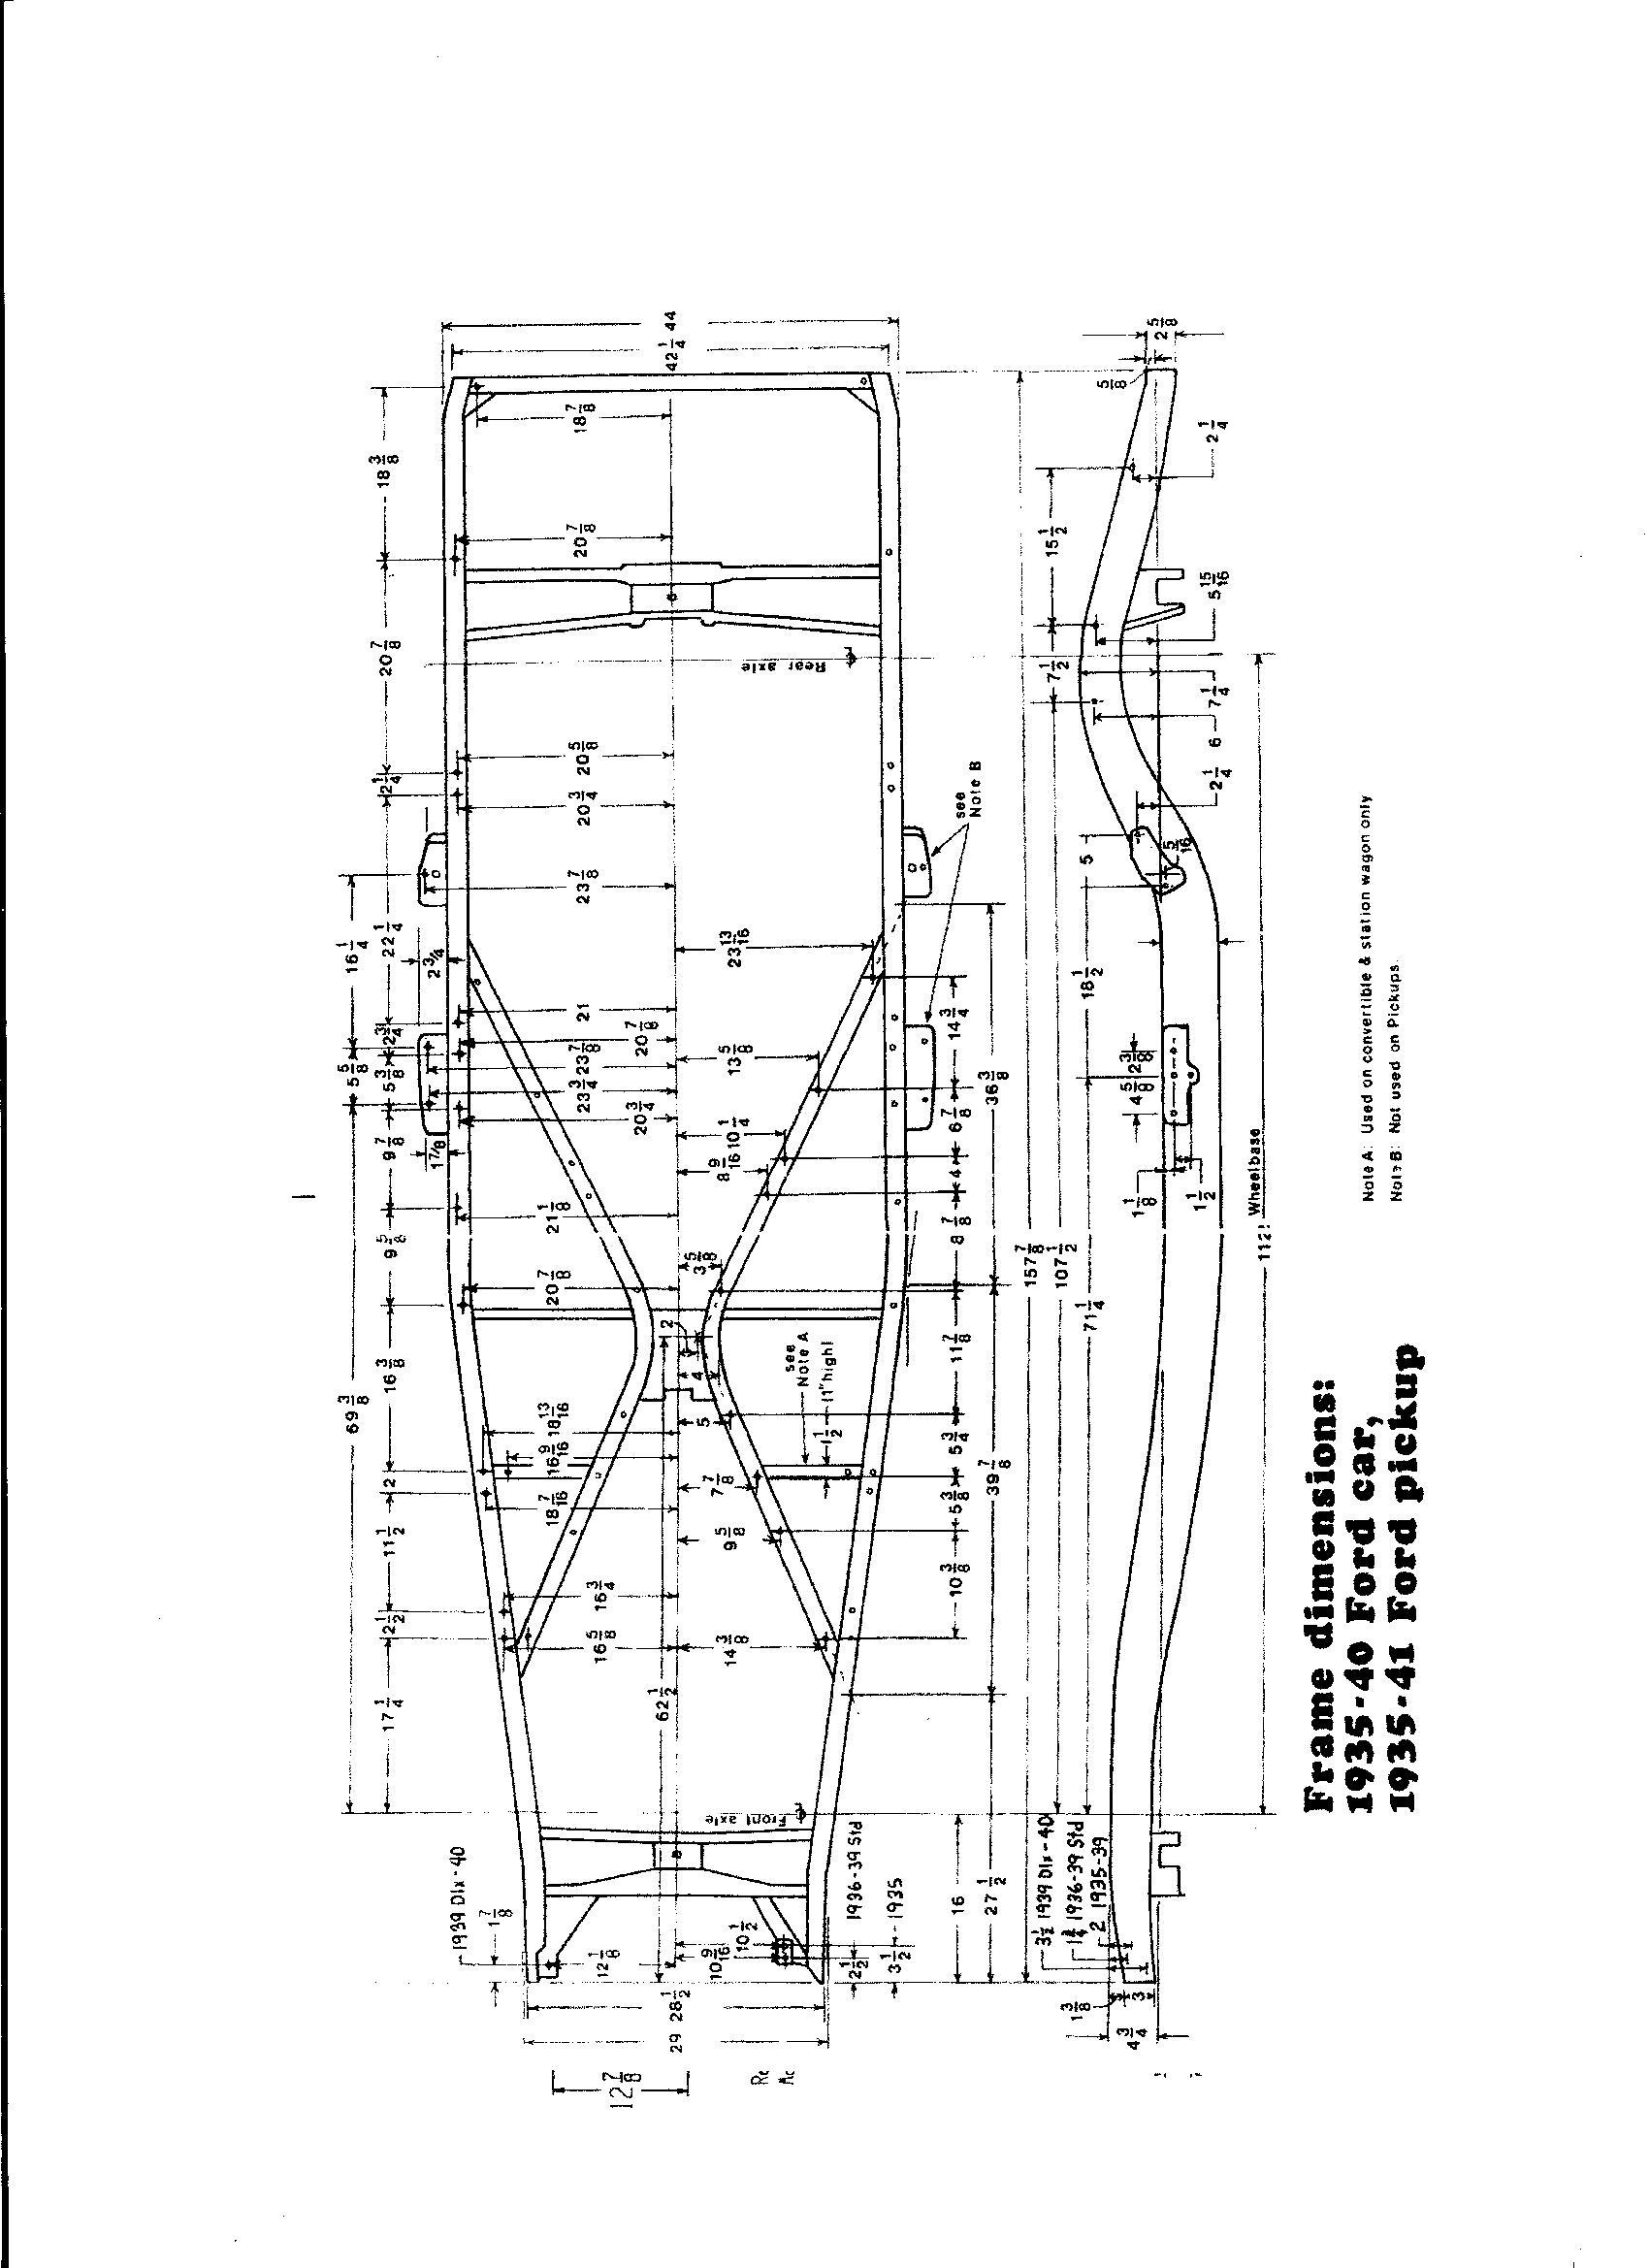 1972 Pontiac Catalina Wiring Diagram. Pontiac. Auto Wiring